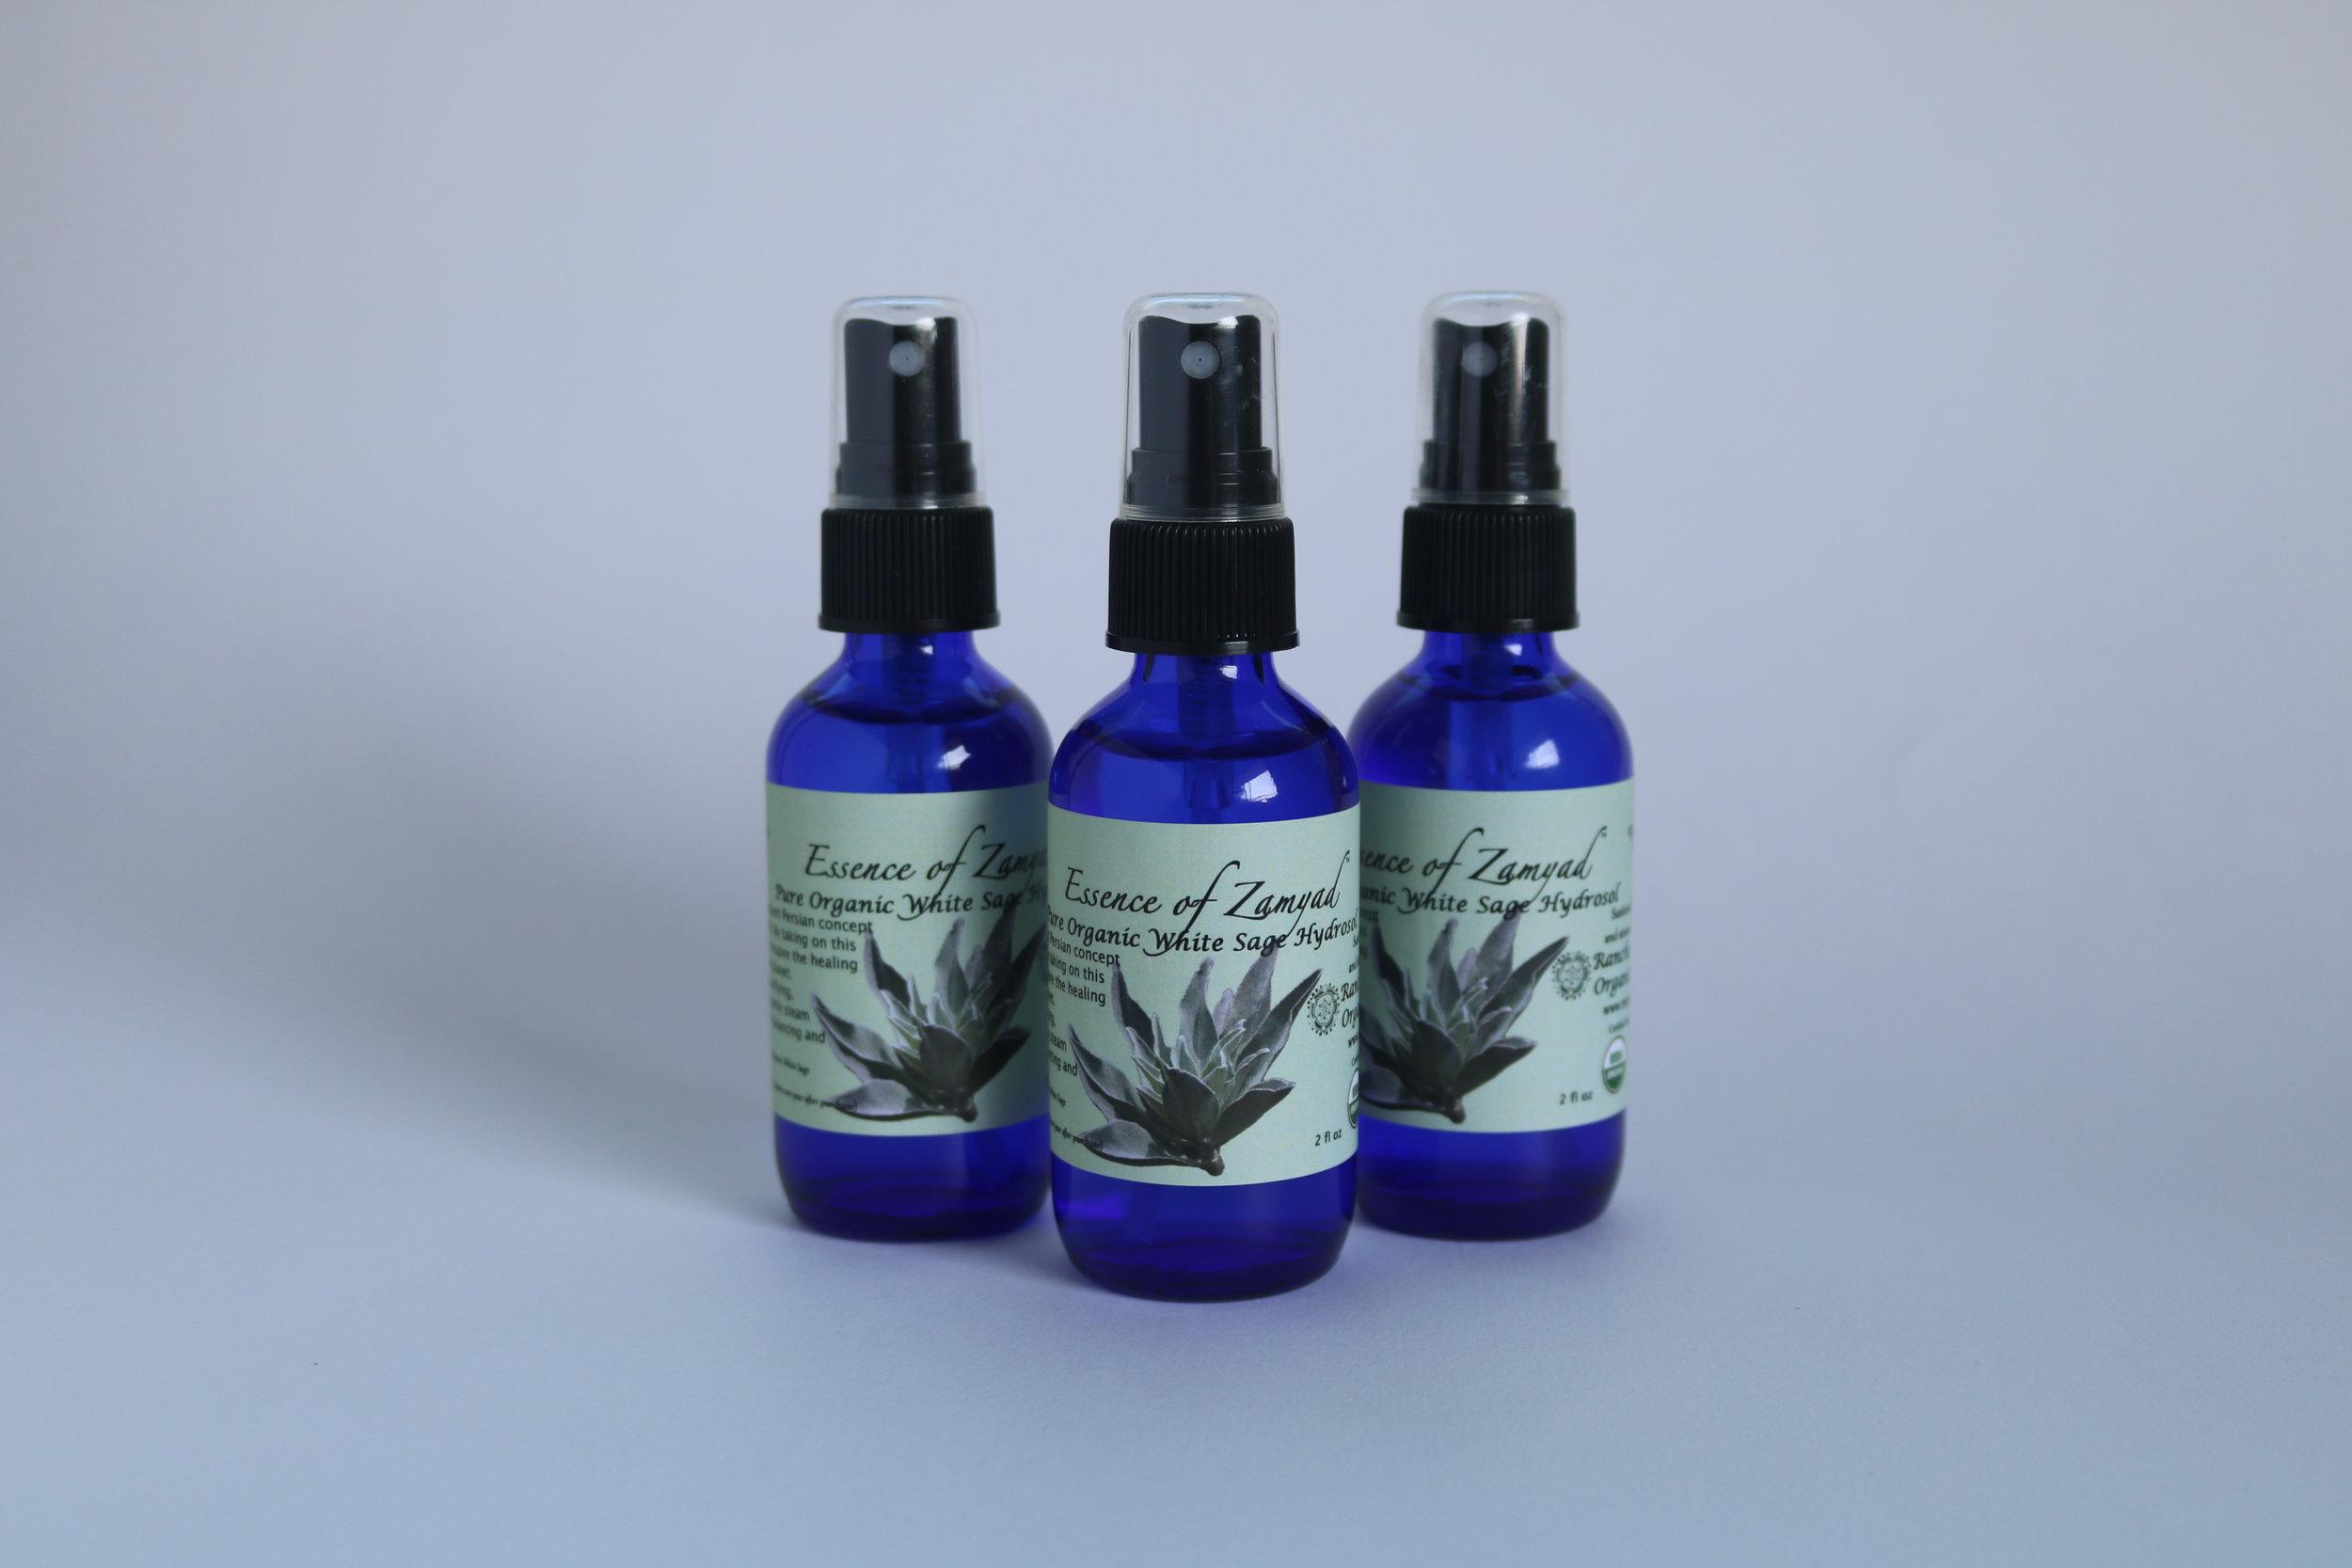 Pure Organic White Sage Hydrosol